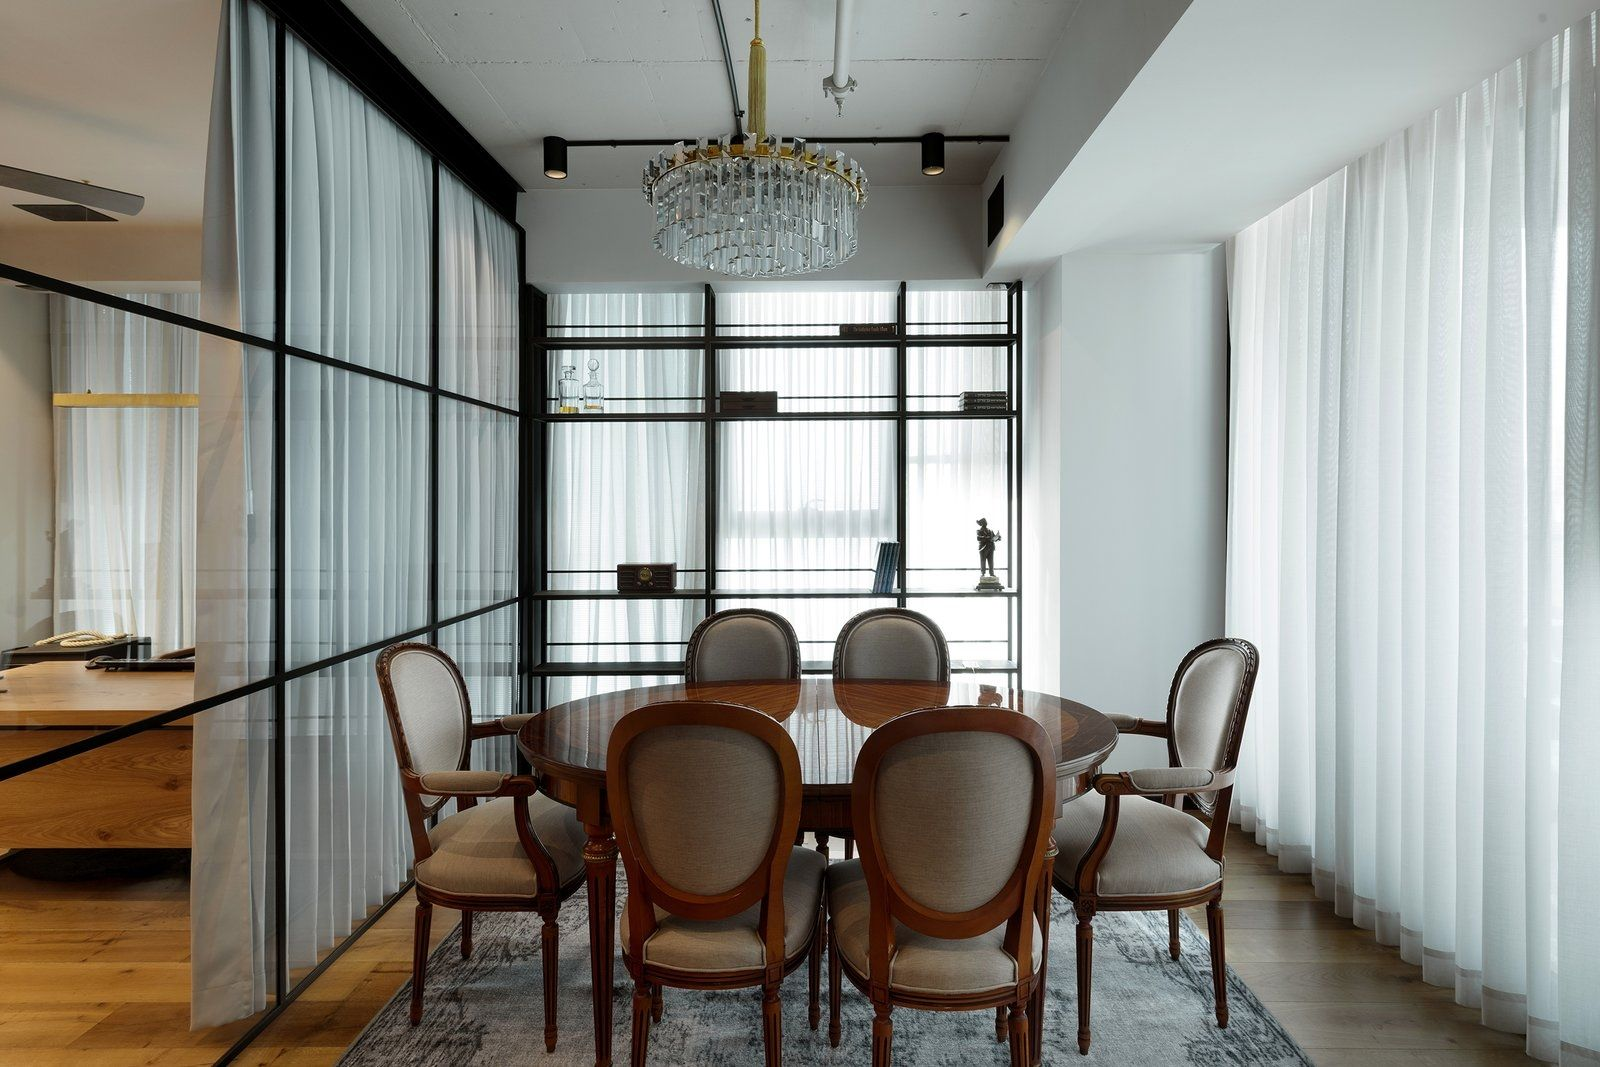 Home design bilder karte brilliant picture of industrial look living roomindustrial look